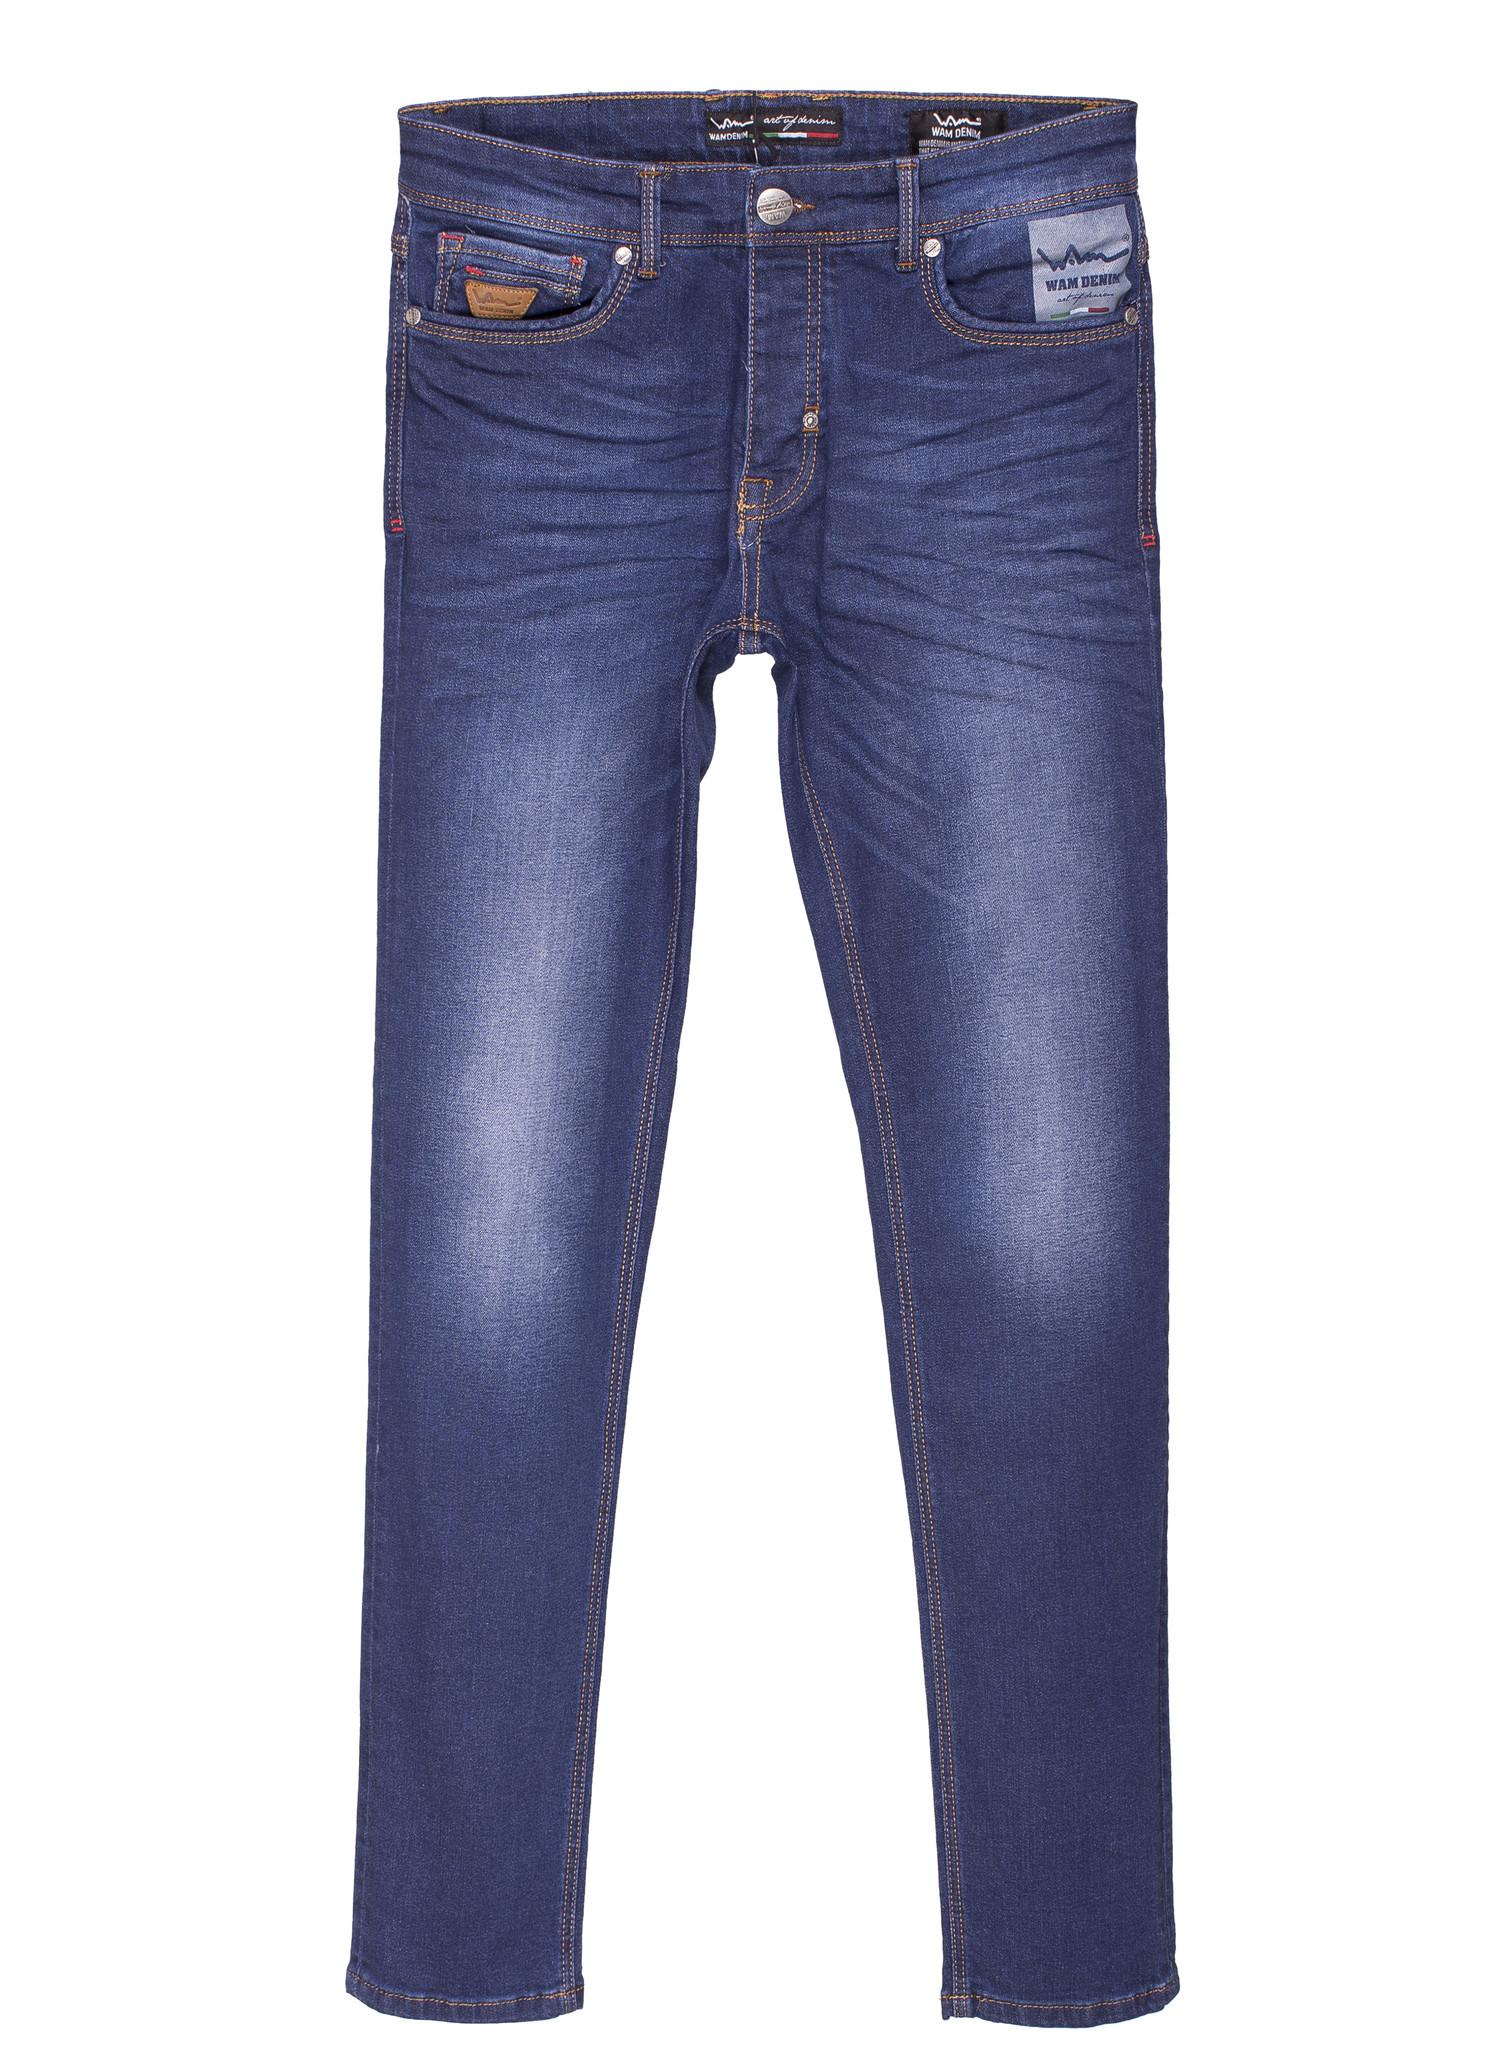 Wam Denim Jeans 72043 Dark Blue